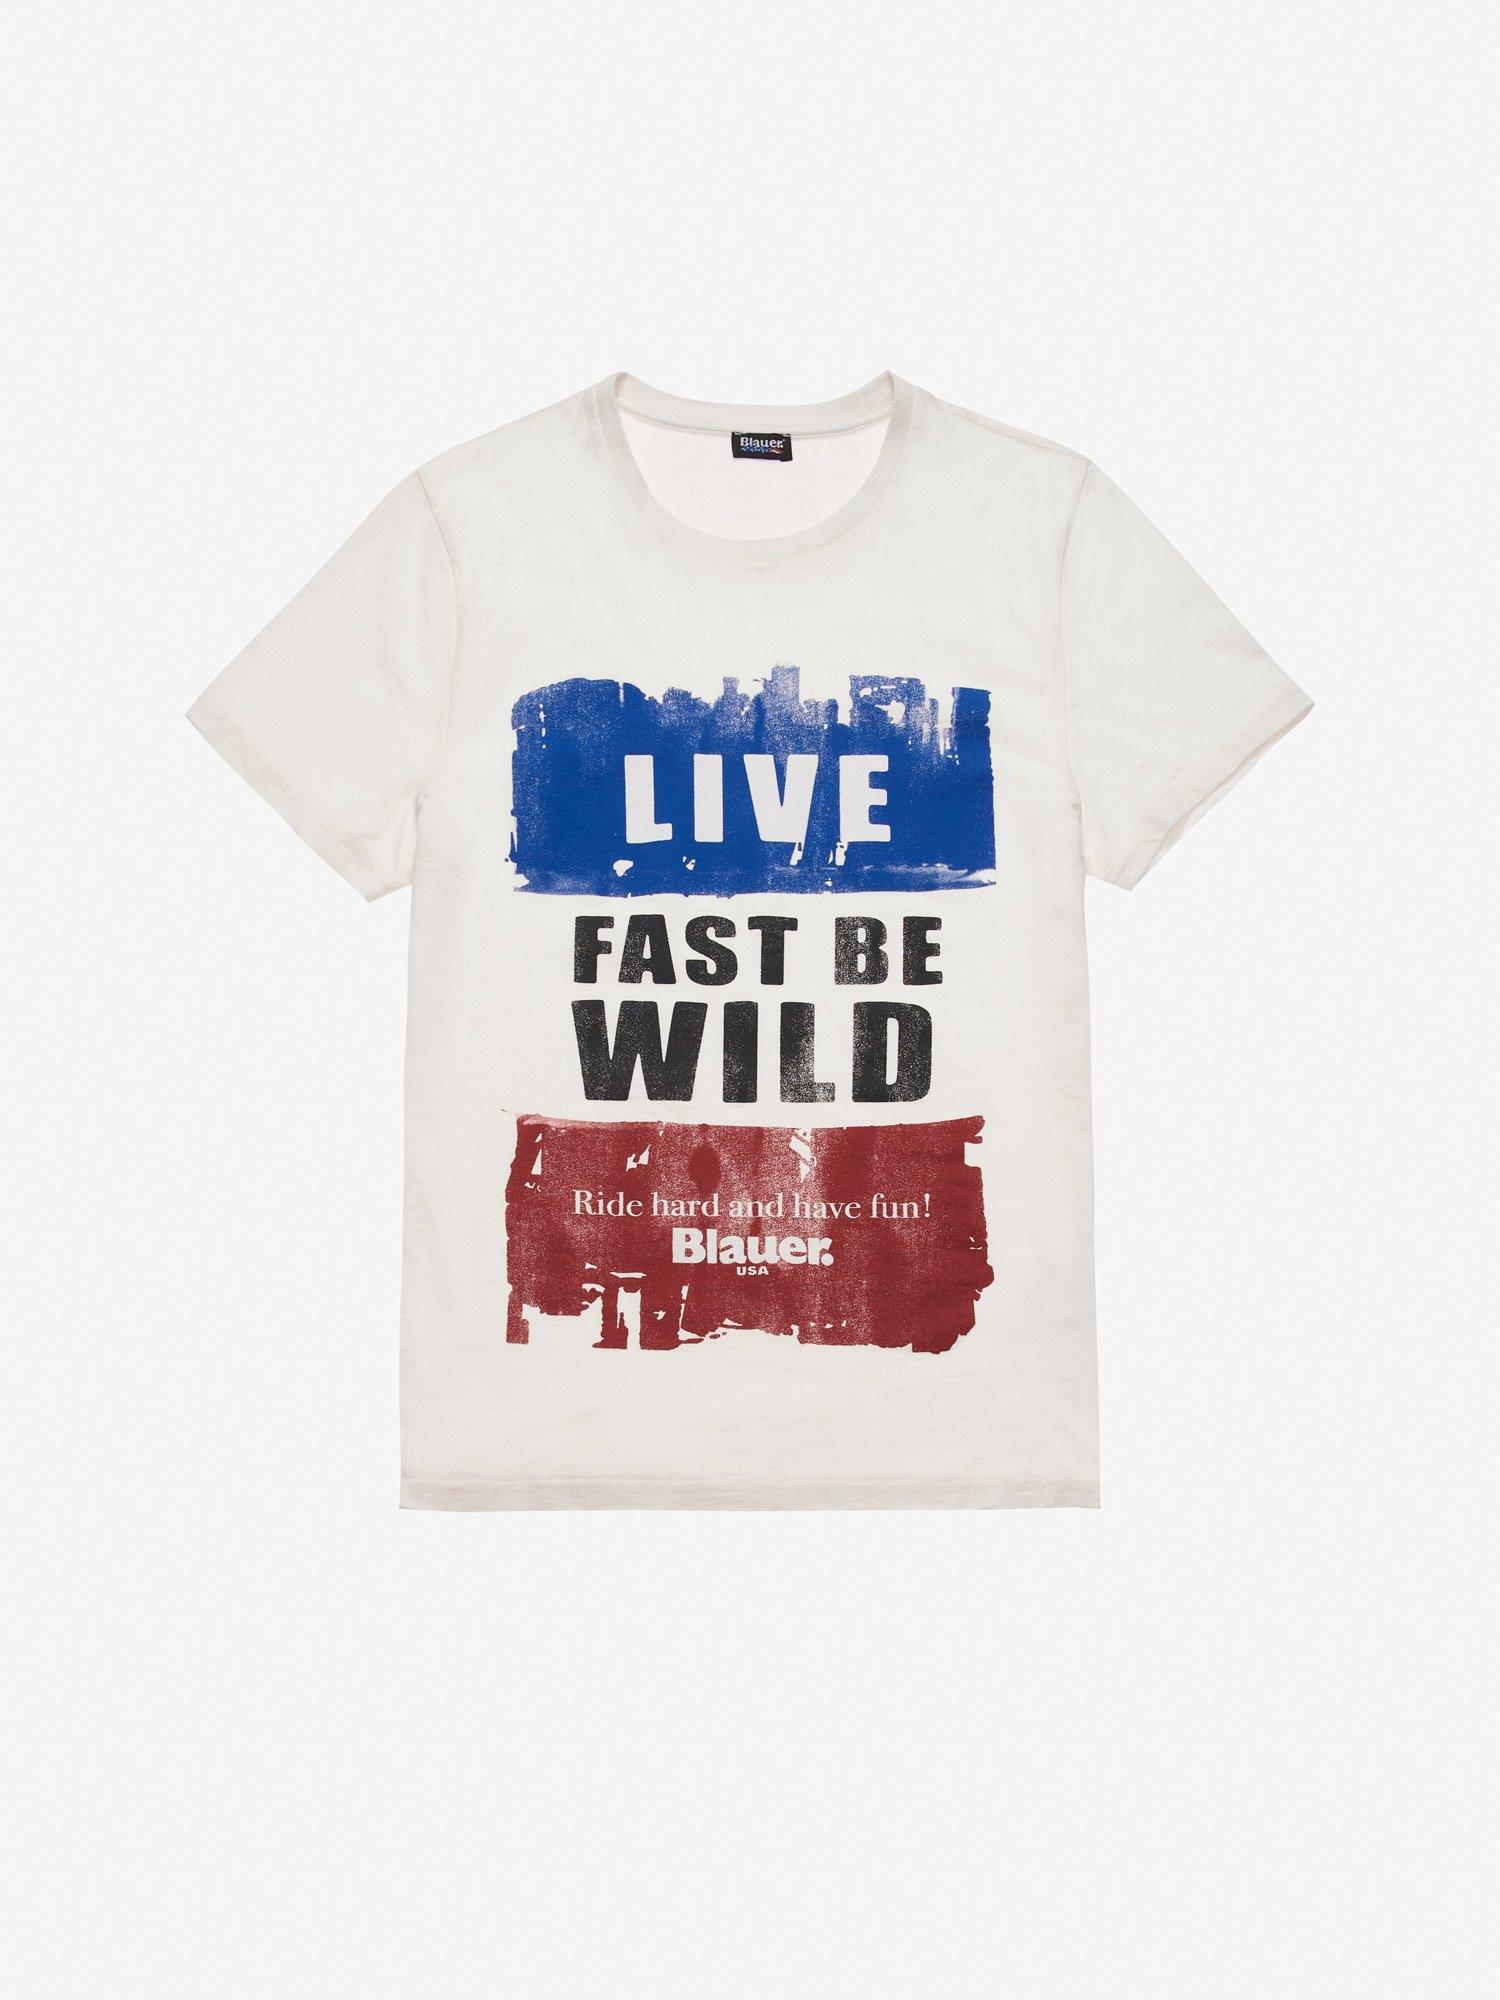 9a012e38 Blauer - LIVE FAST BE WILD T-SHIRT - Ivory - 1 ...